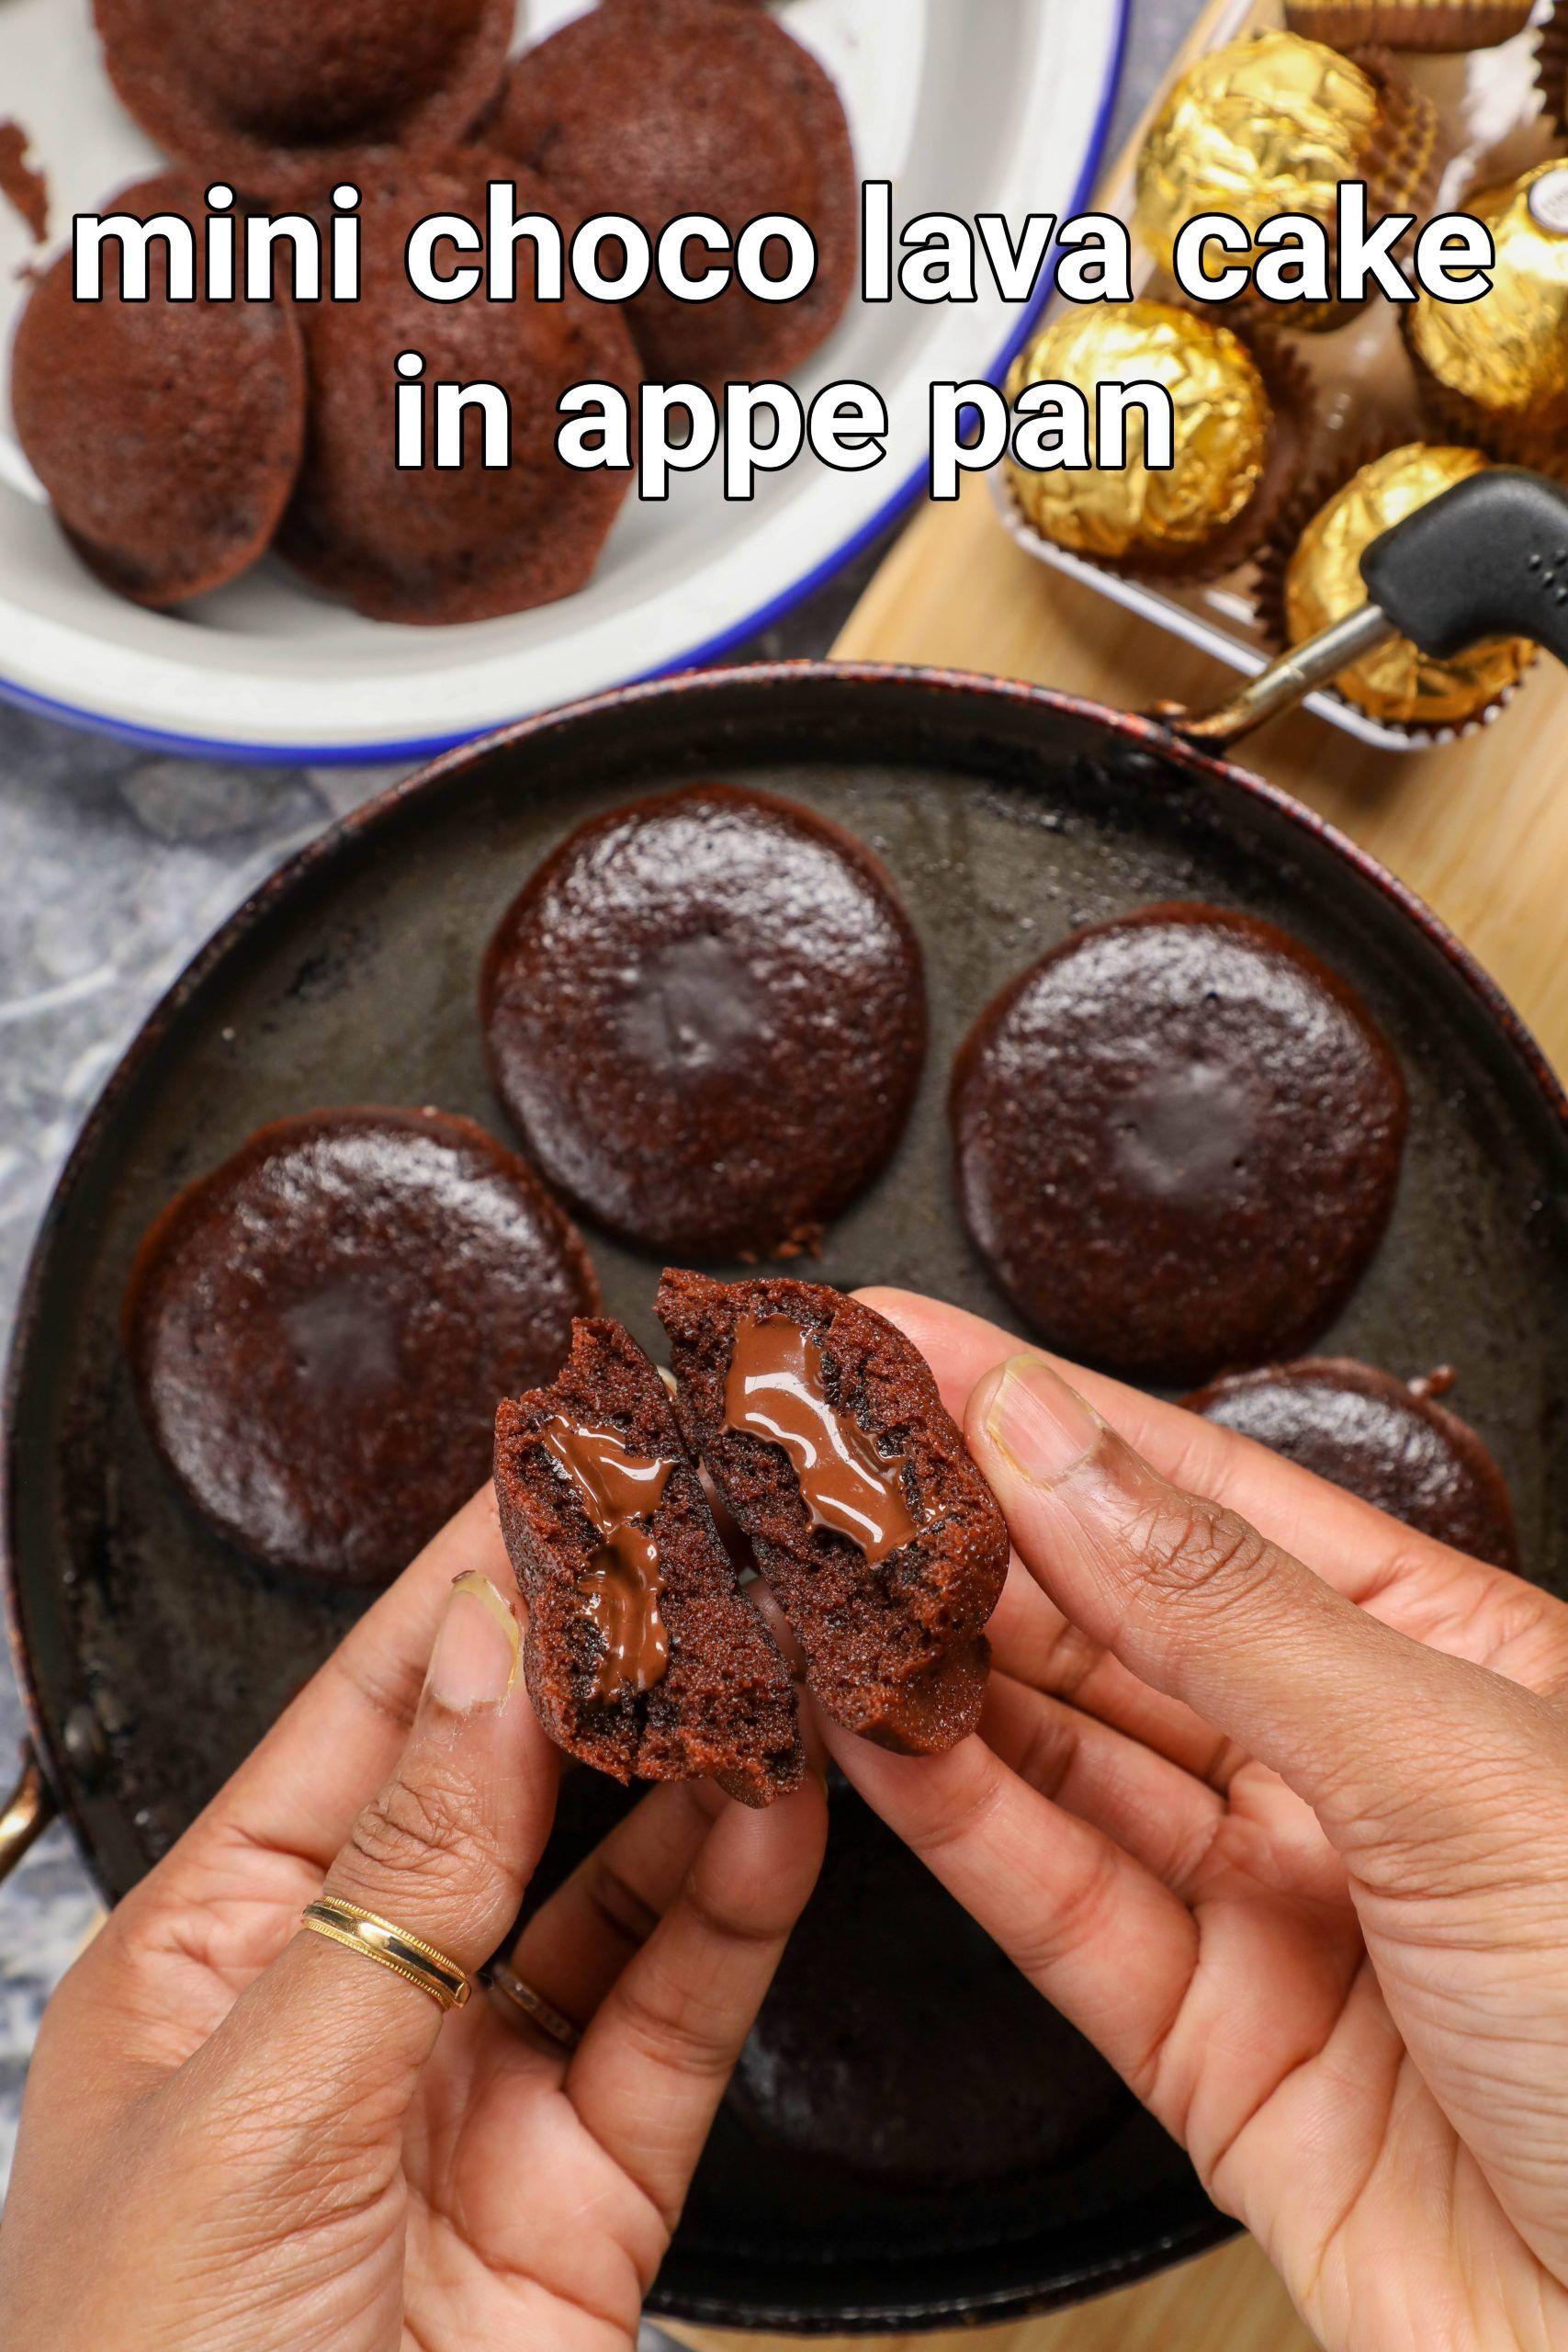 Mini Choco Lava Cake In Appam Pan Eggless Choco Lava Cake In Appe Pan Recipe In 2021 Lava Cakes Choco Lava Lava Cake Recipes